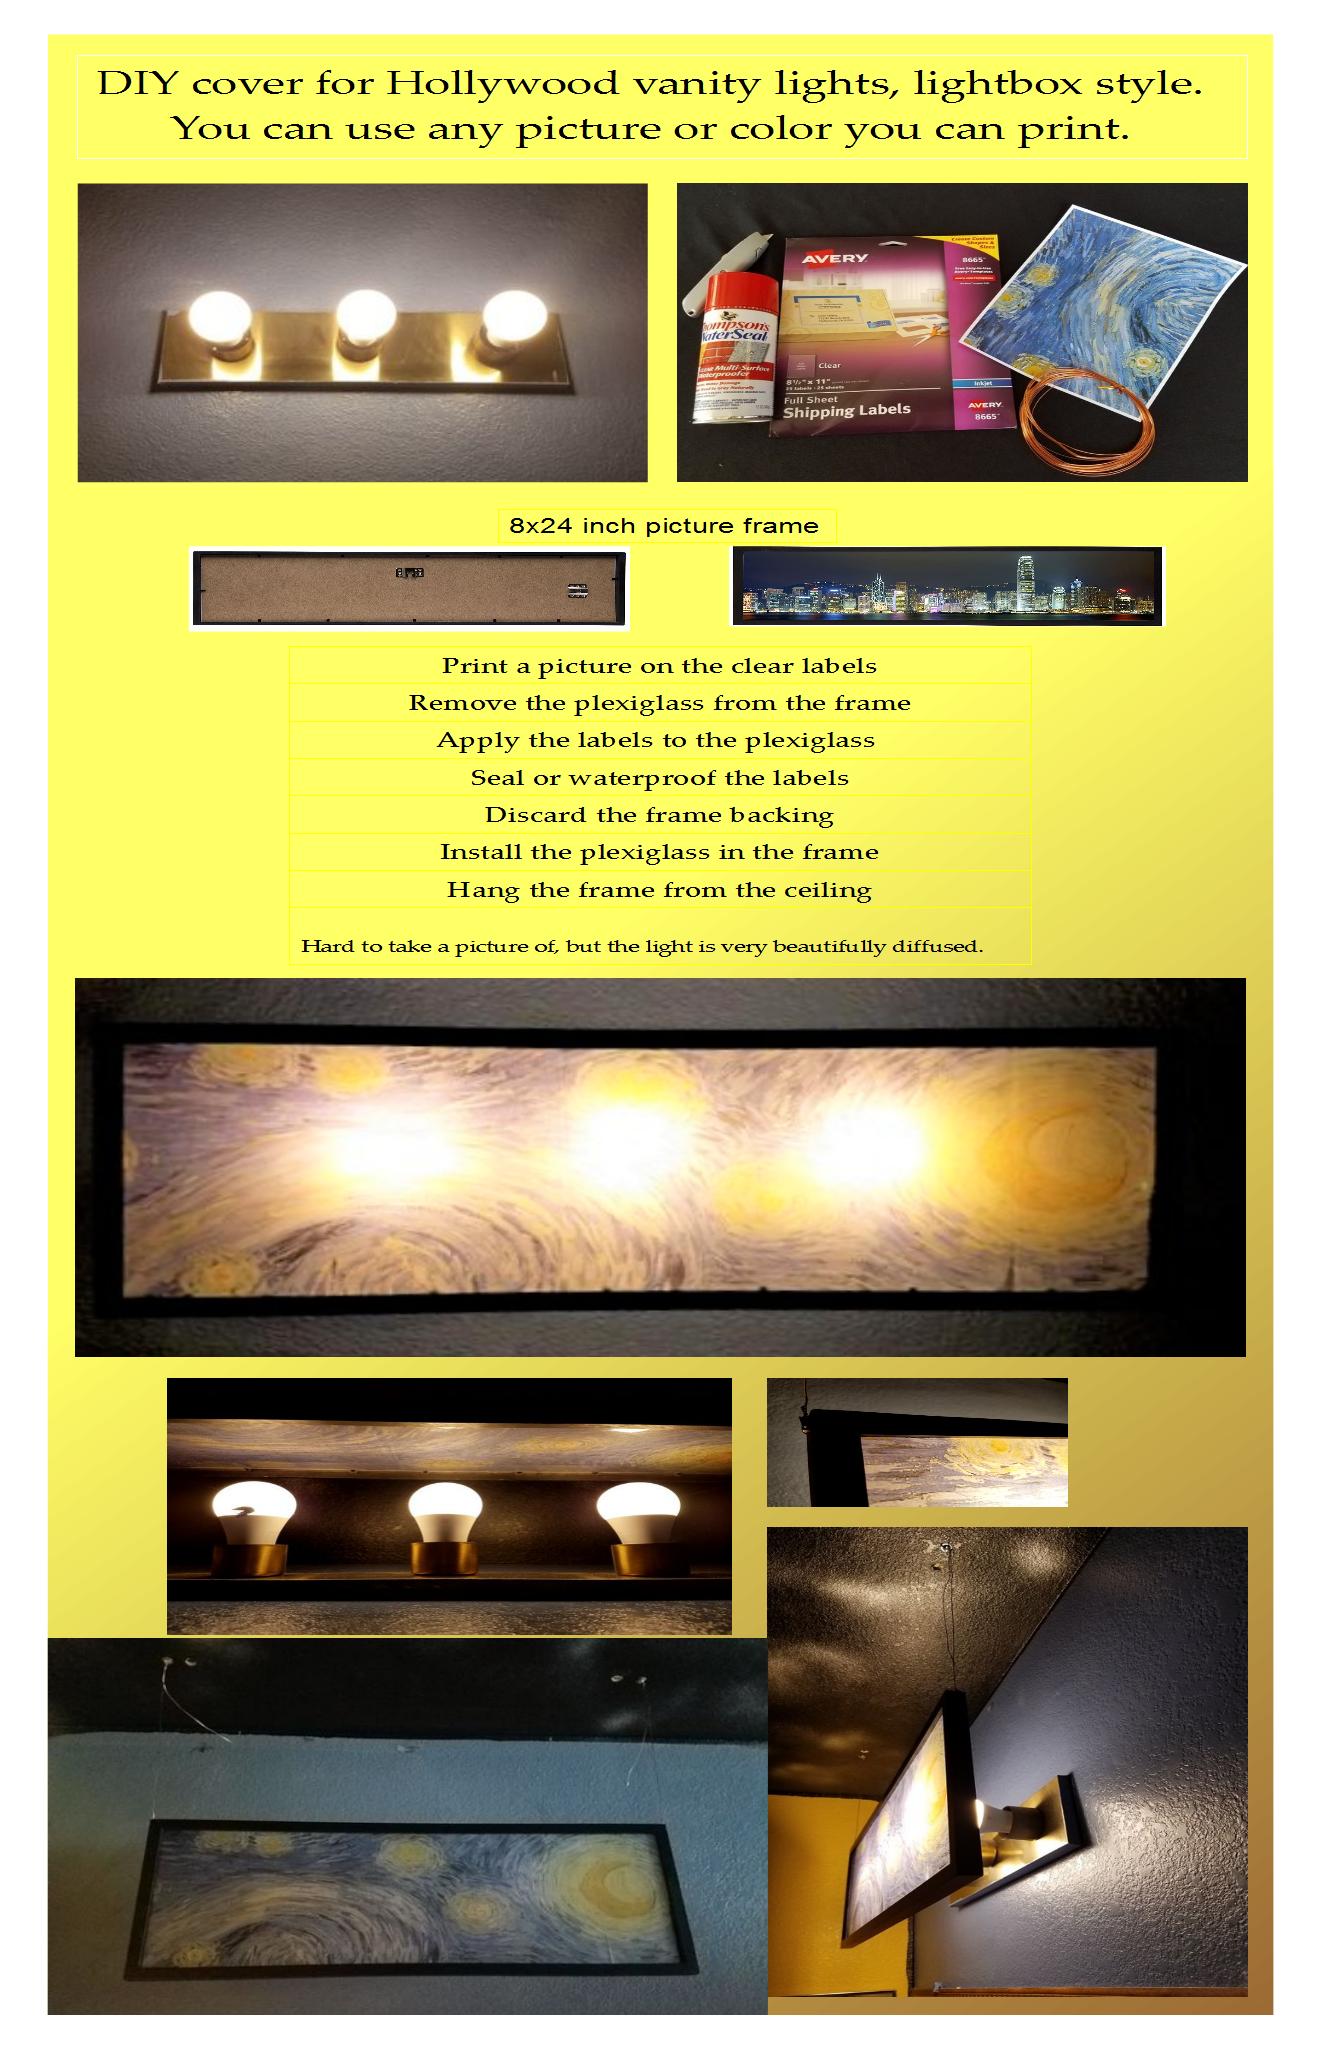 Diy how to make a cover shade for builder hollywood vanity light diy how to make a cover shade for builder hollywood vanity light strips easy home upgrade aloadofball Choice Image